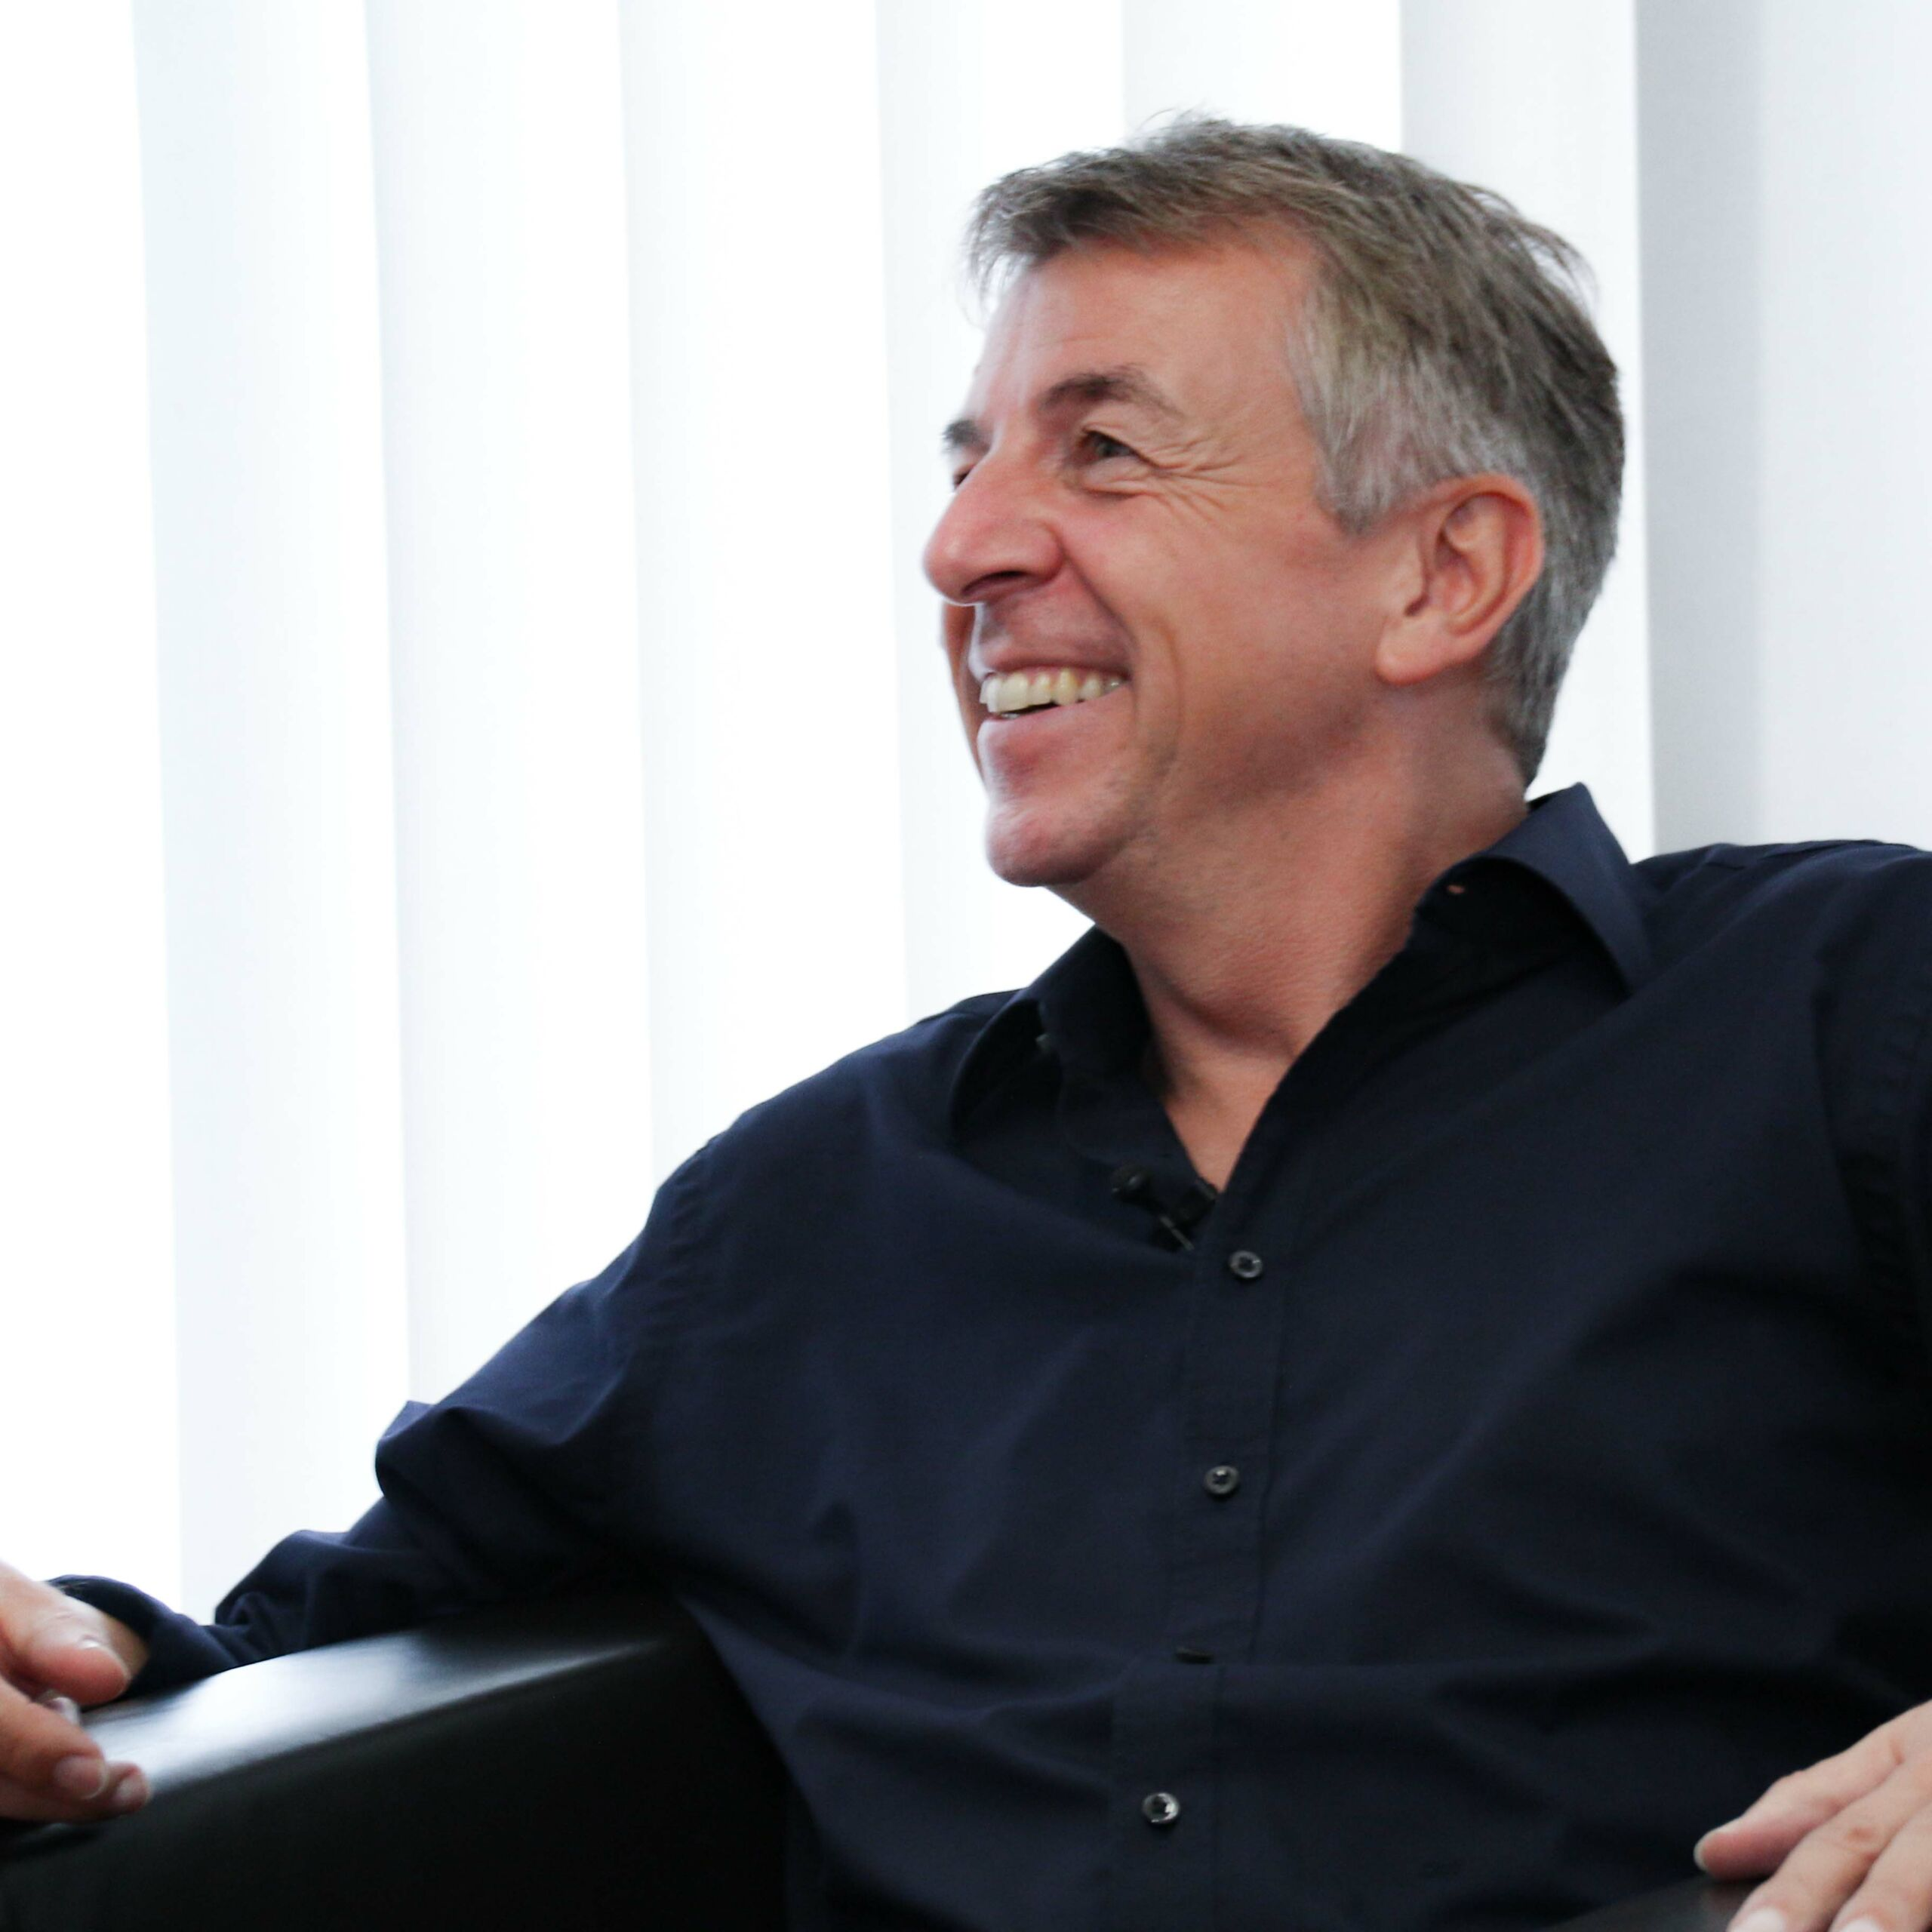 Motivationstrainer / Mental Coach / Motivationscoach Dirk Schmidt